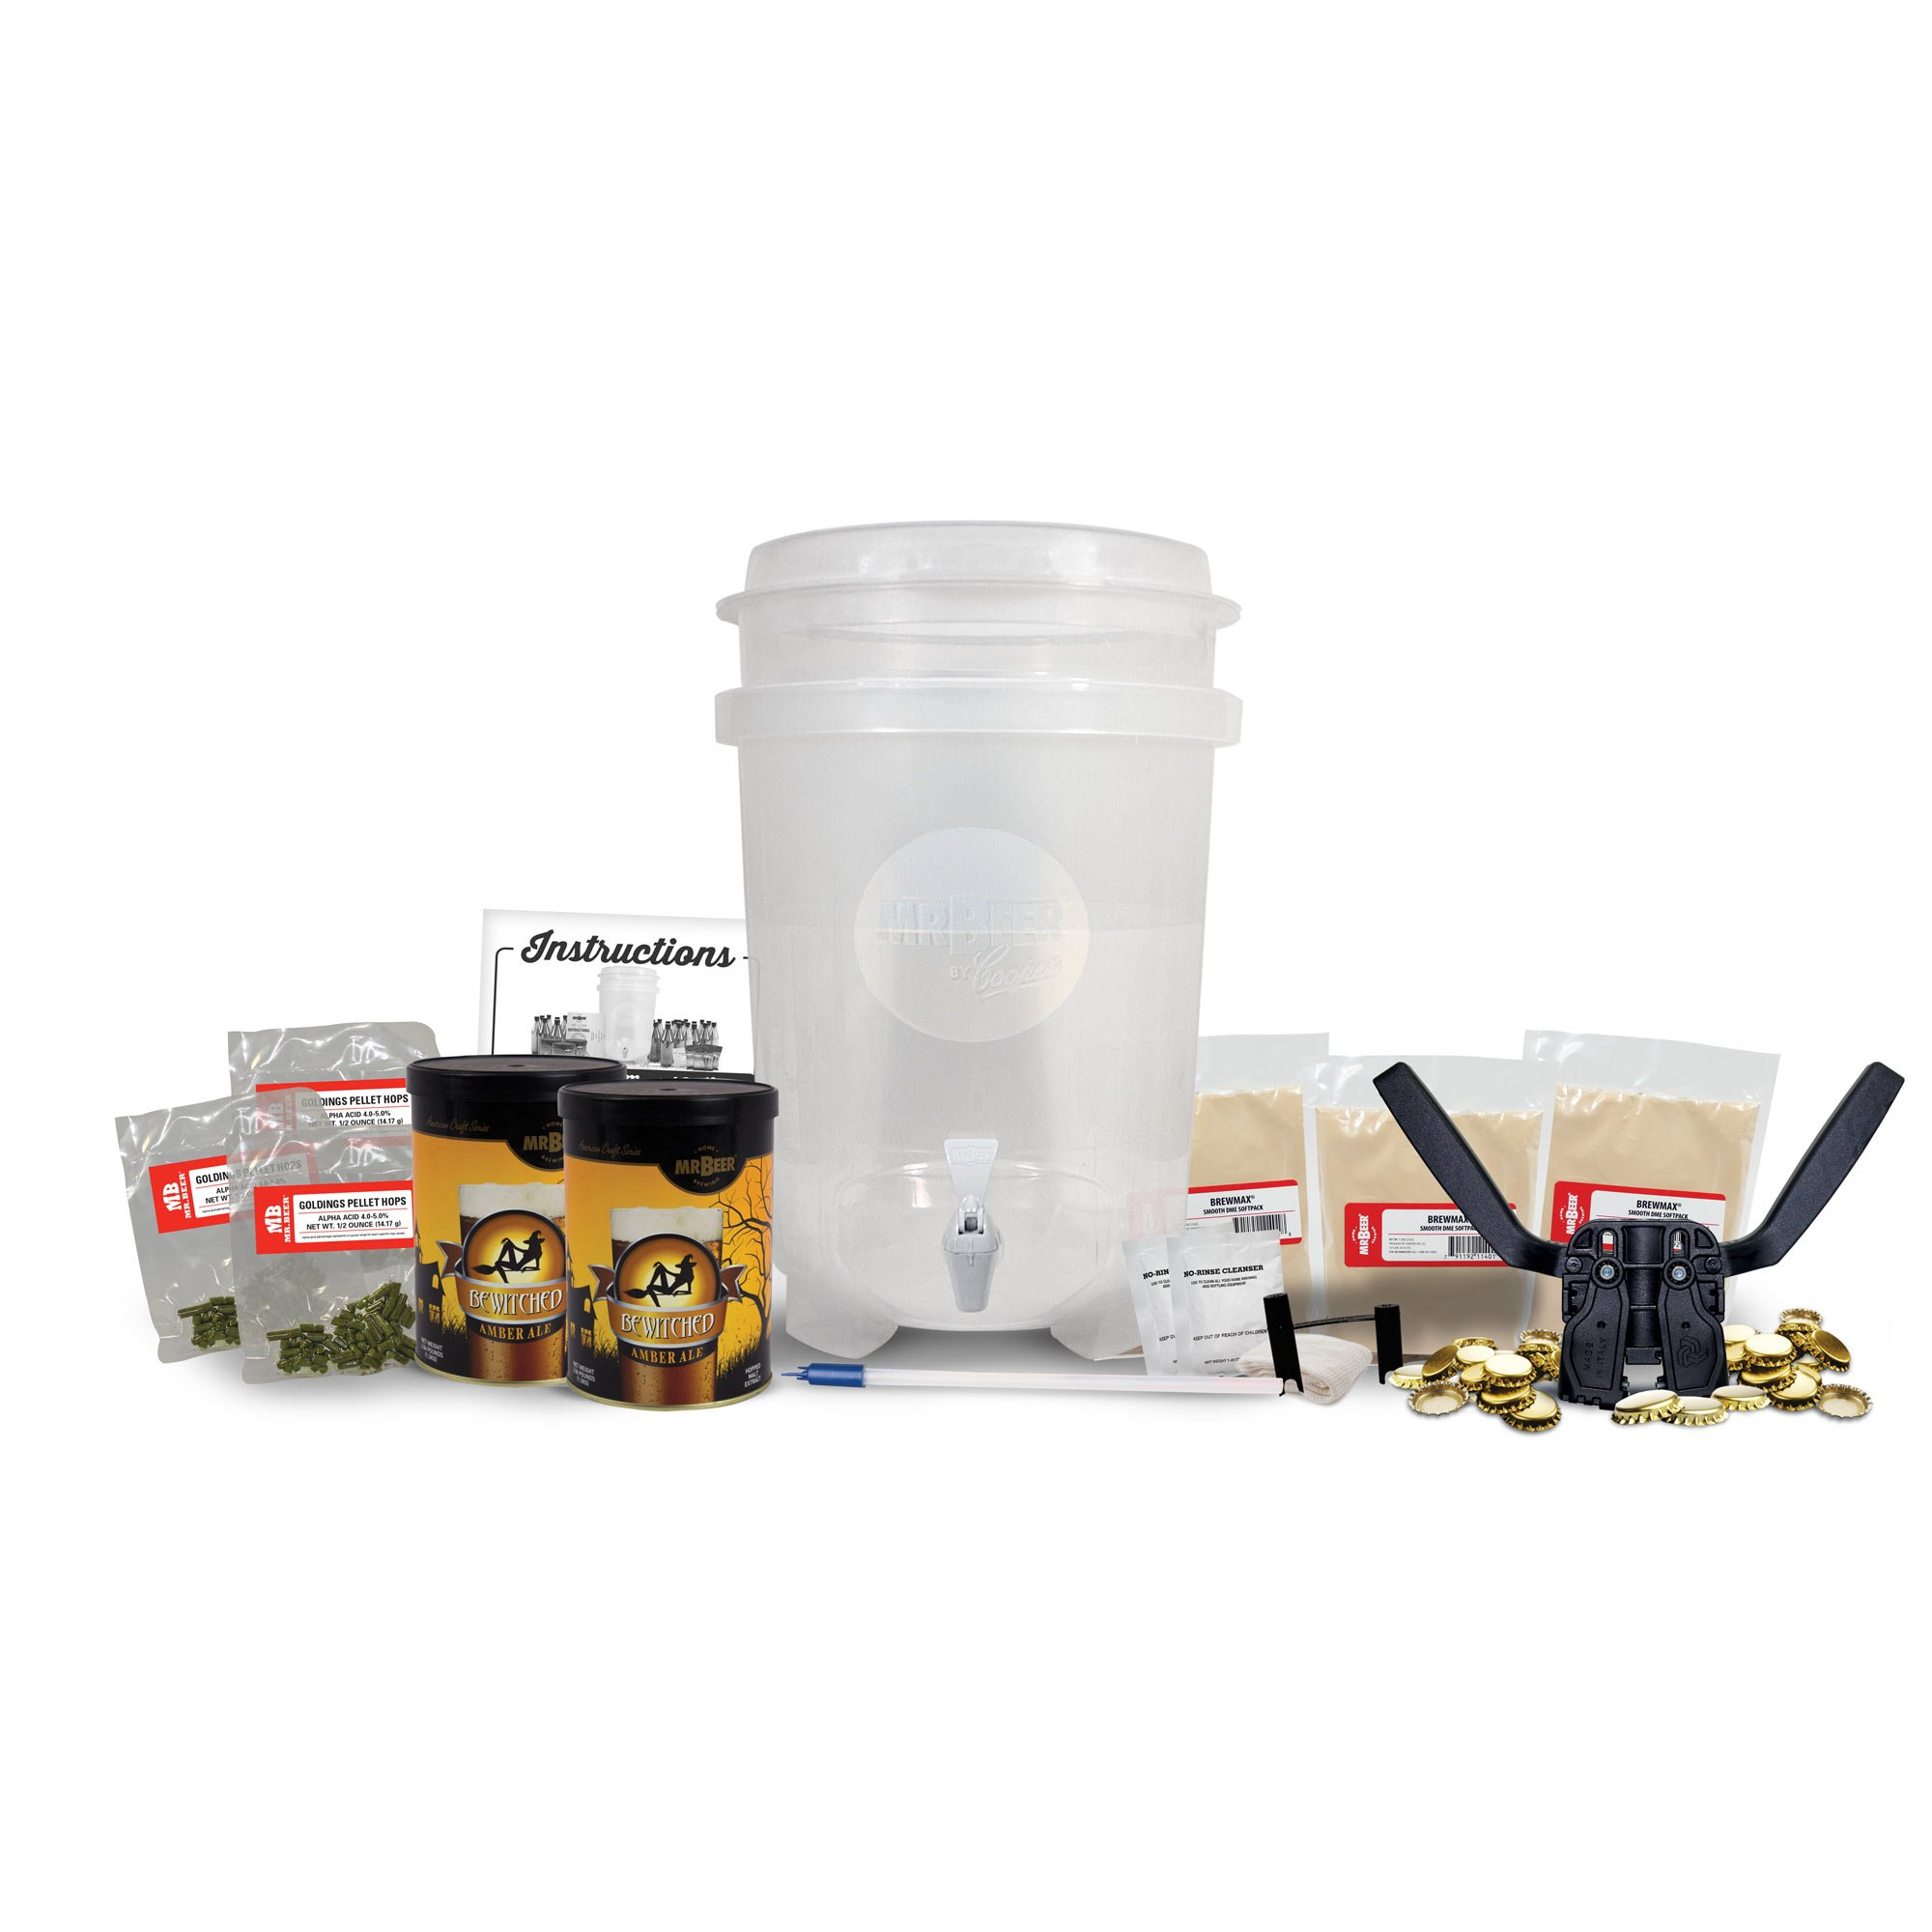 Mr. Beer Brewmax 6 Gallon Homebrewing Craft Beer Making Kit